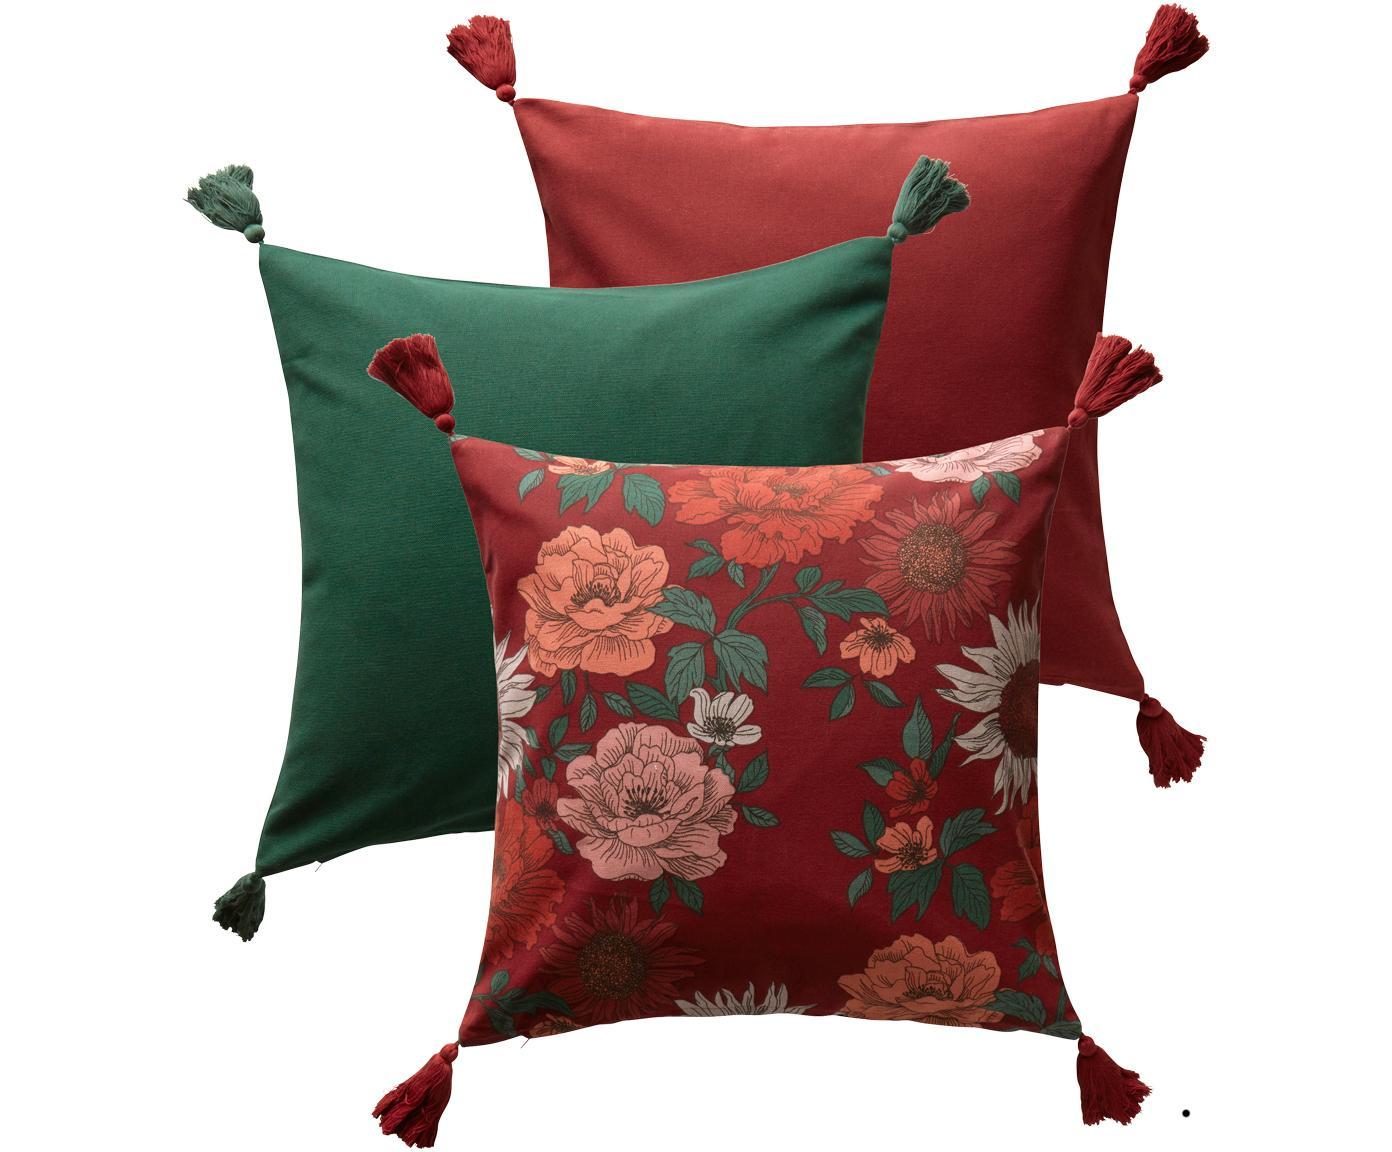 Kissenhüllen Marianne in Rot/Grün, 3er-Set, Baumwolle, Rot, Grün, 50 x 50 cm